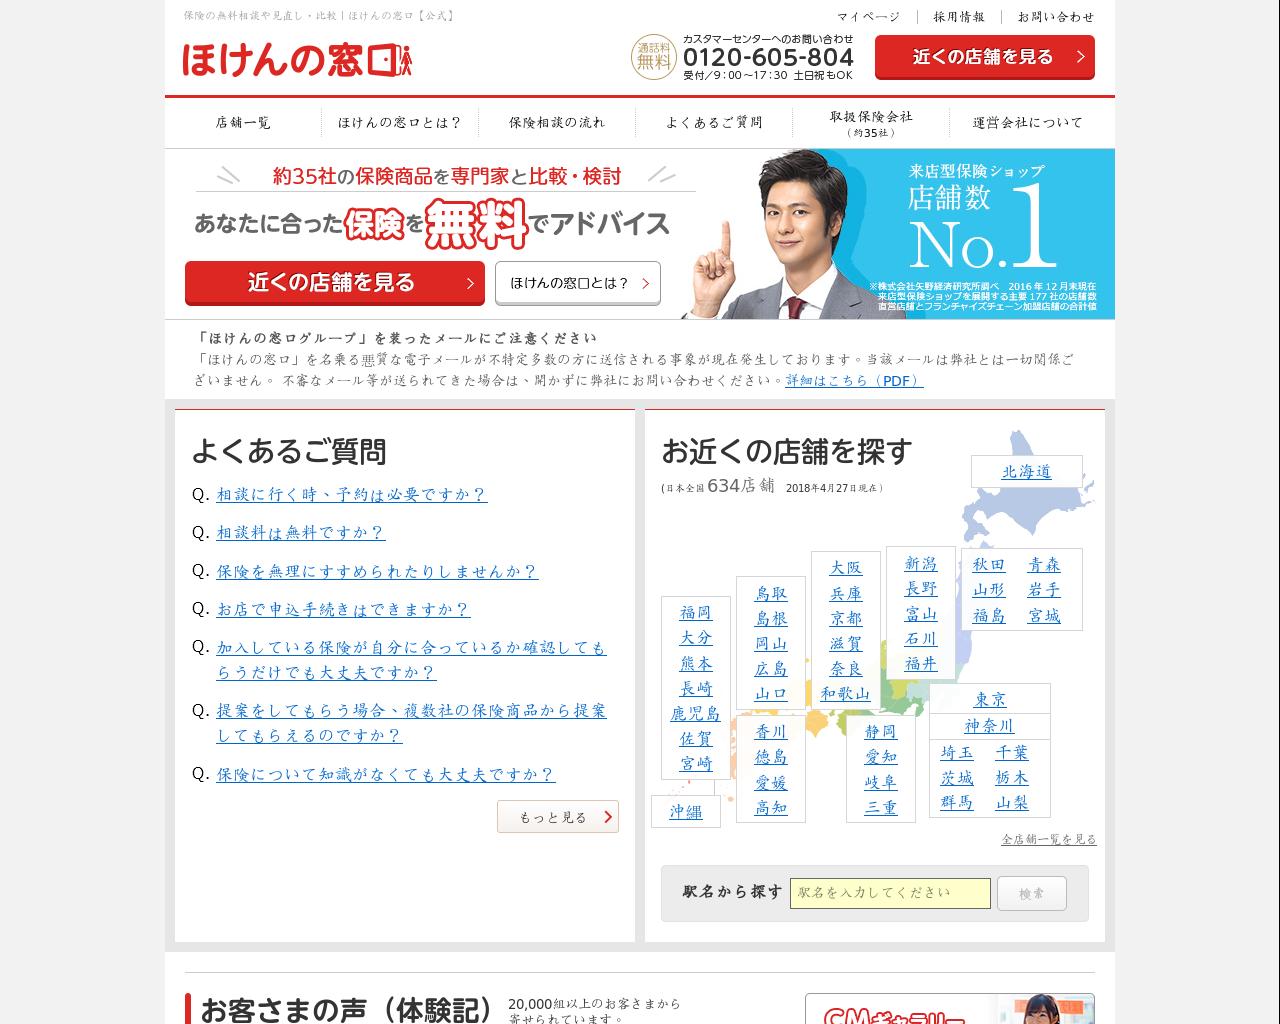 www.hokennomadoguchi.com(2018/05/14 05:50:42)